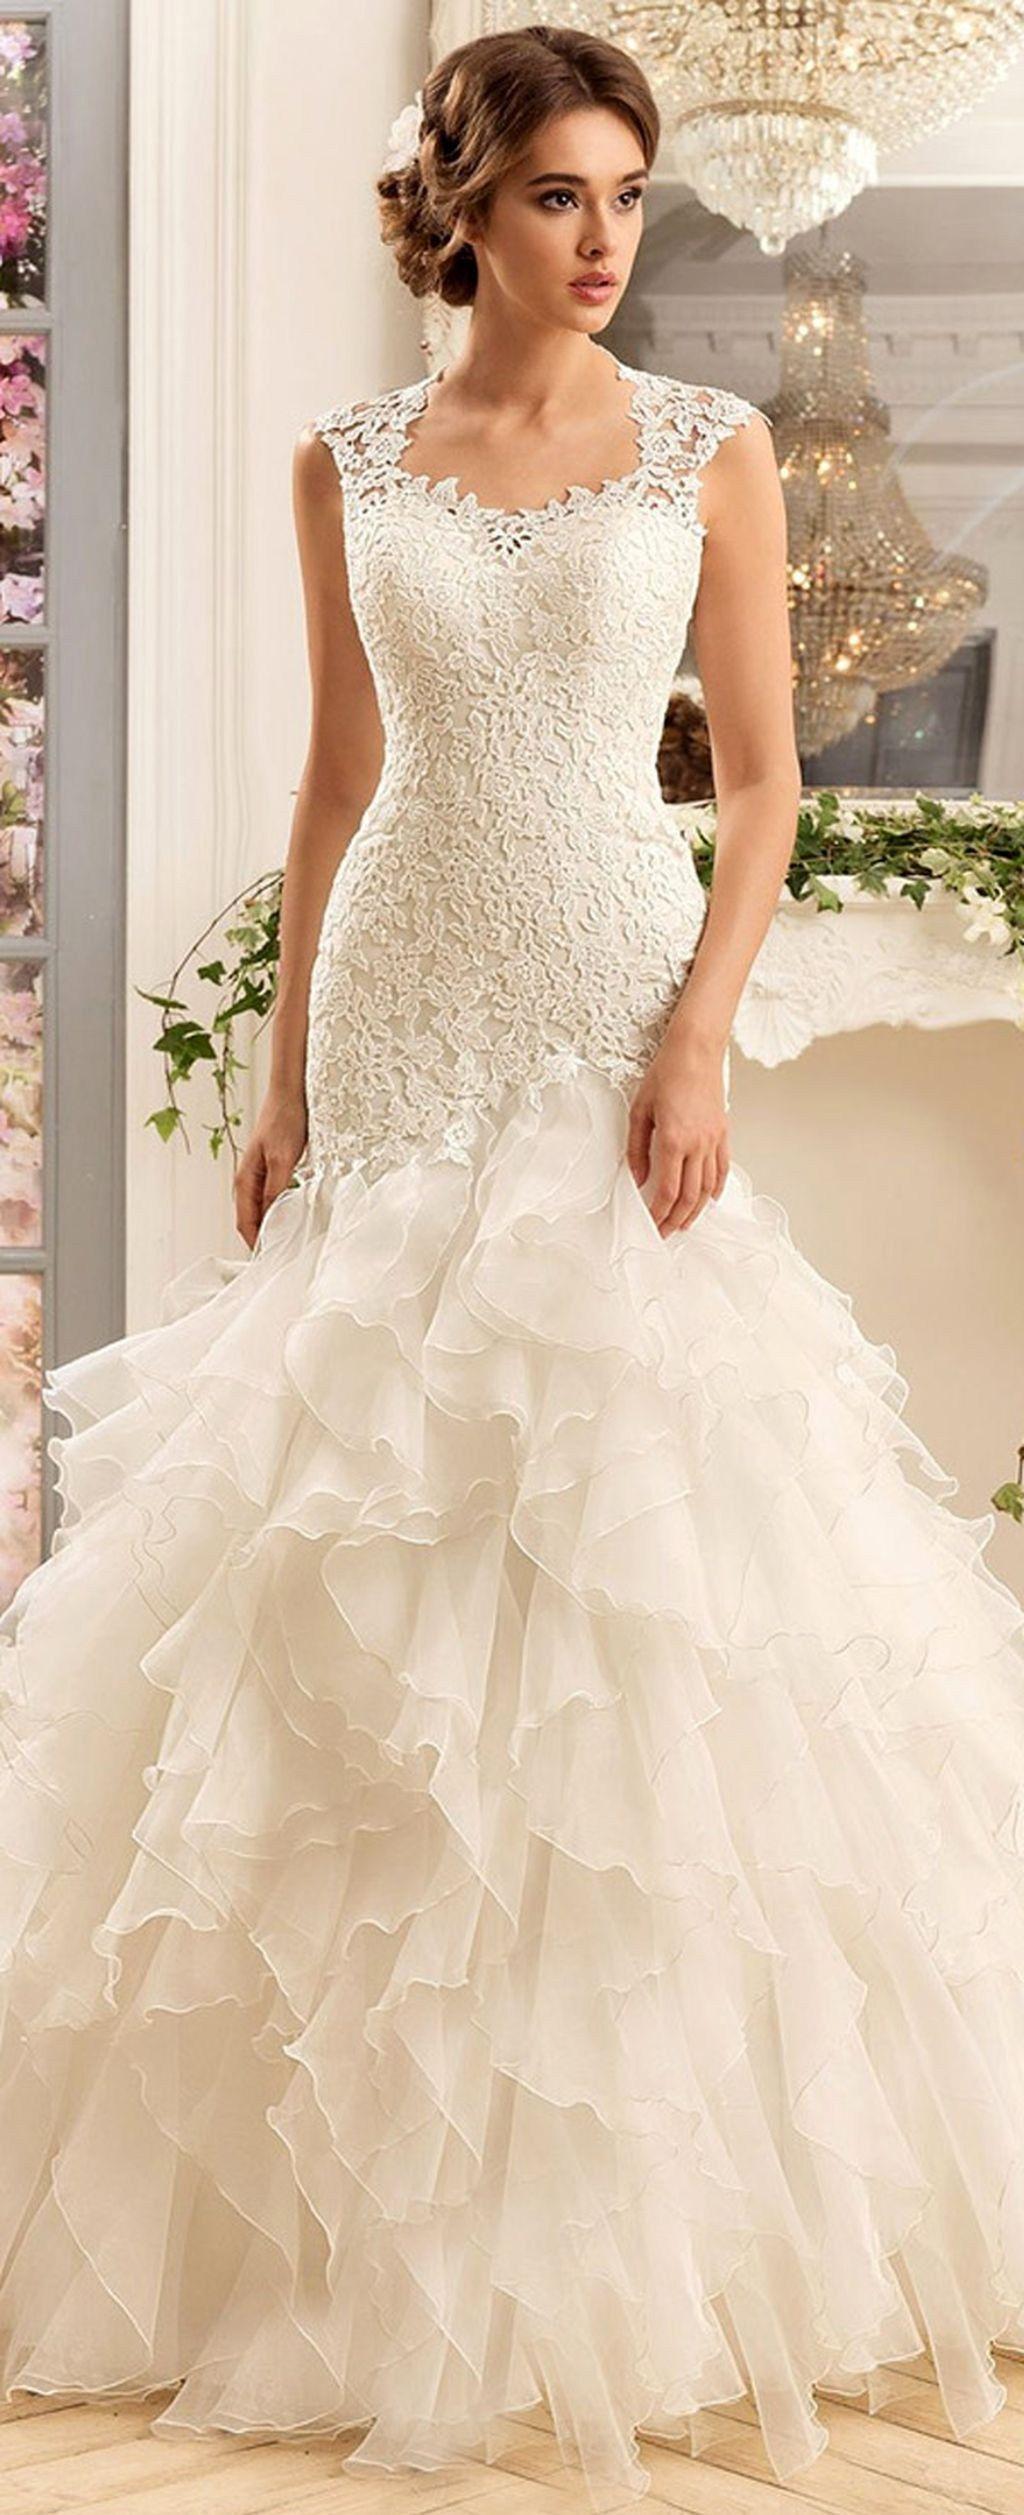 Rustic Vintage Wedding Dresses